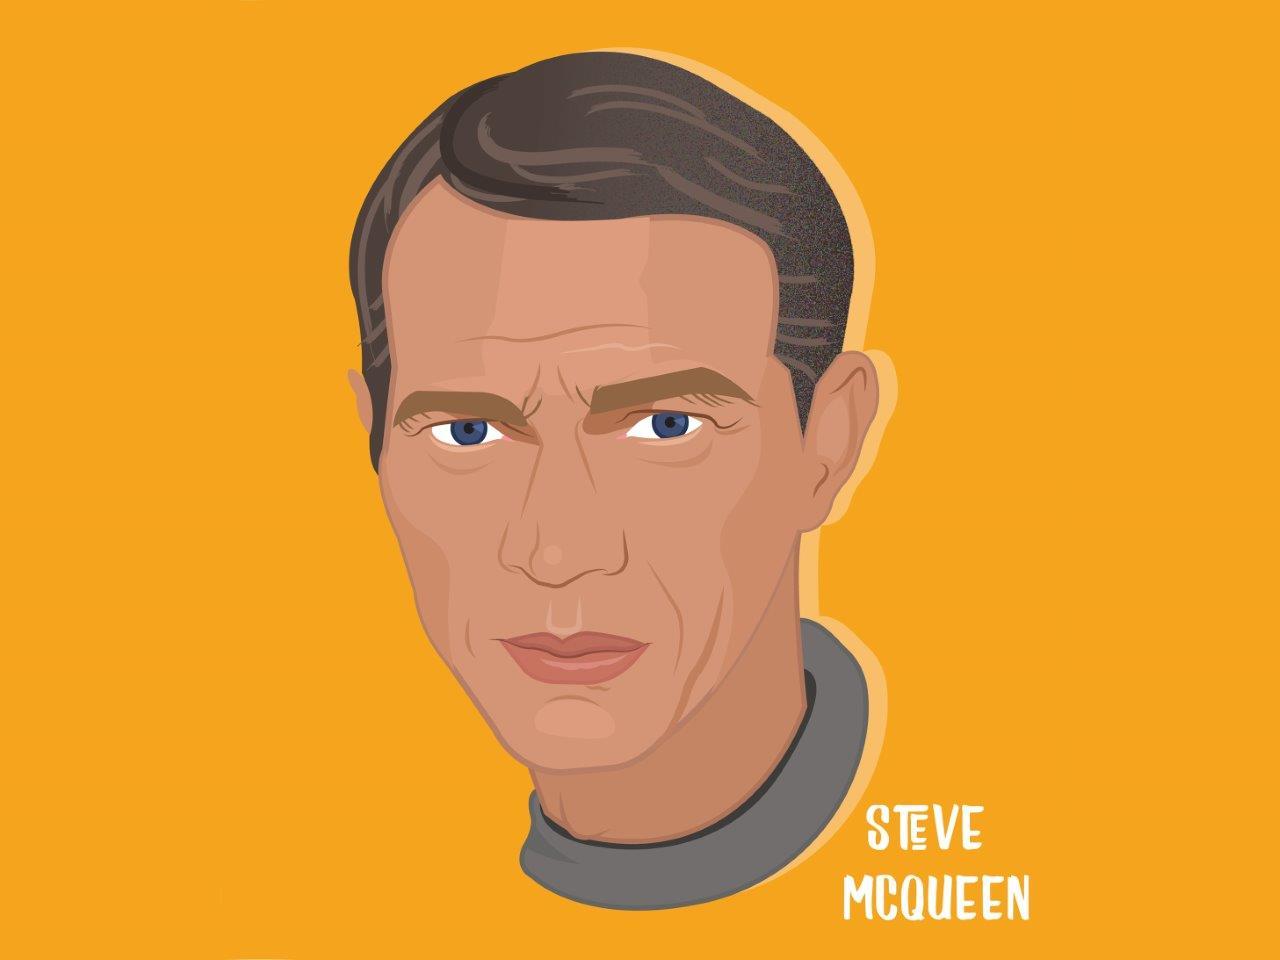 Steve McQueen Illustration